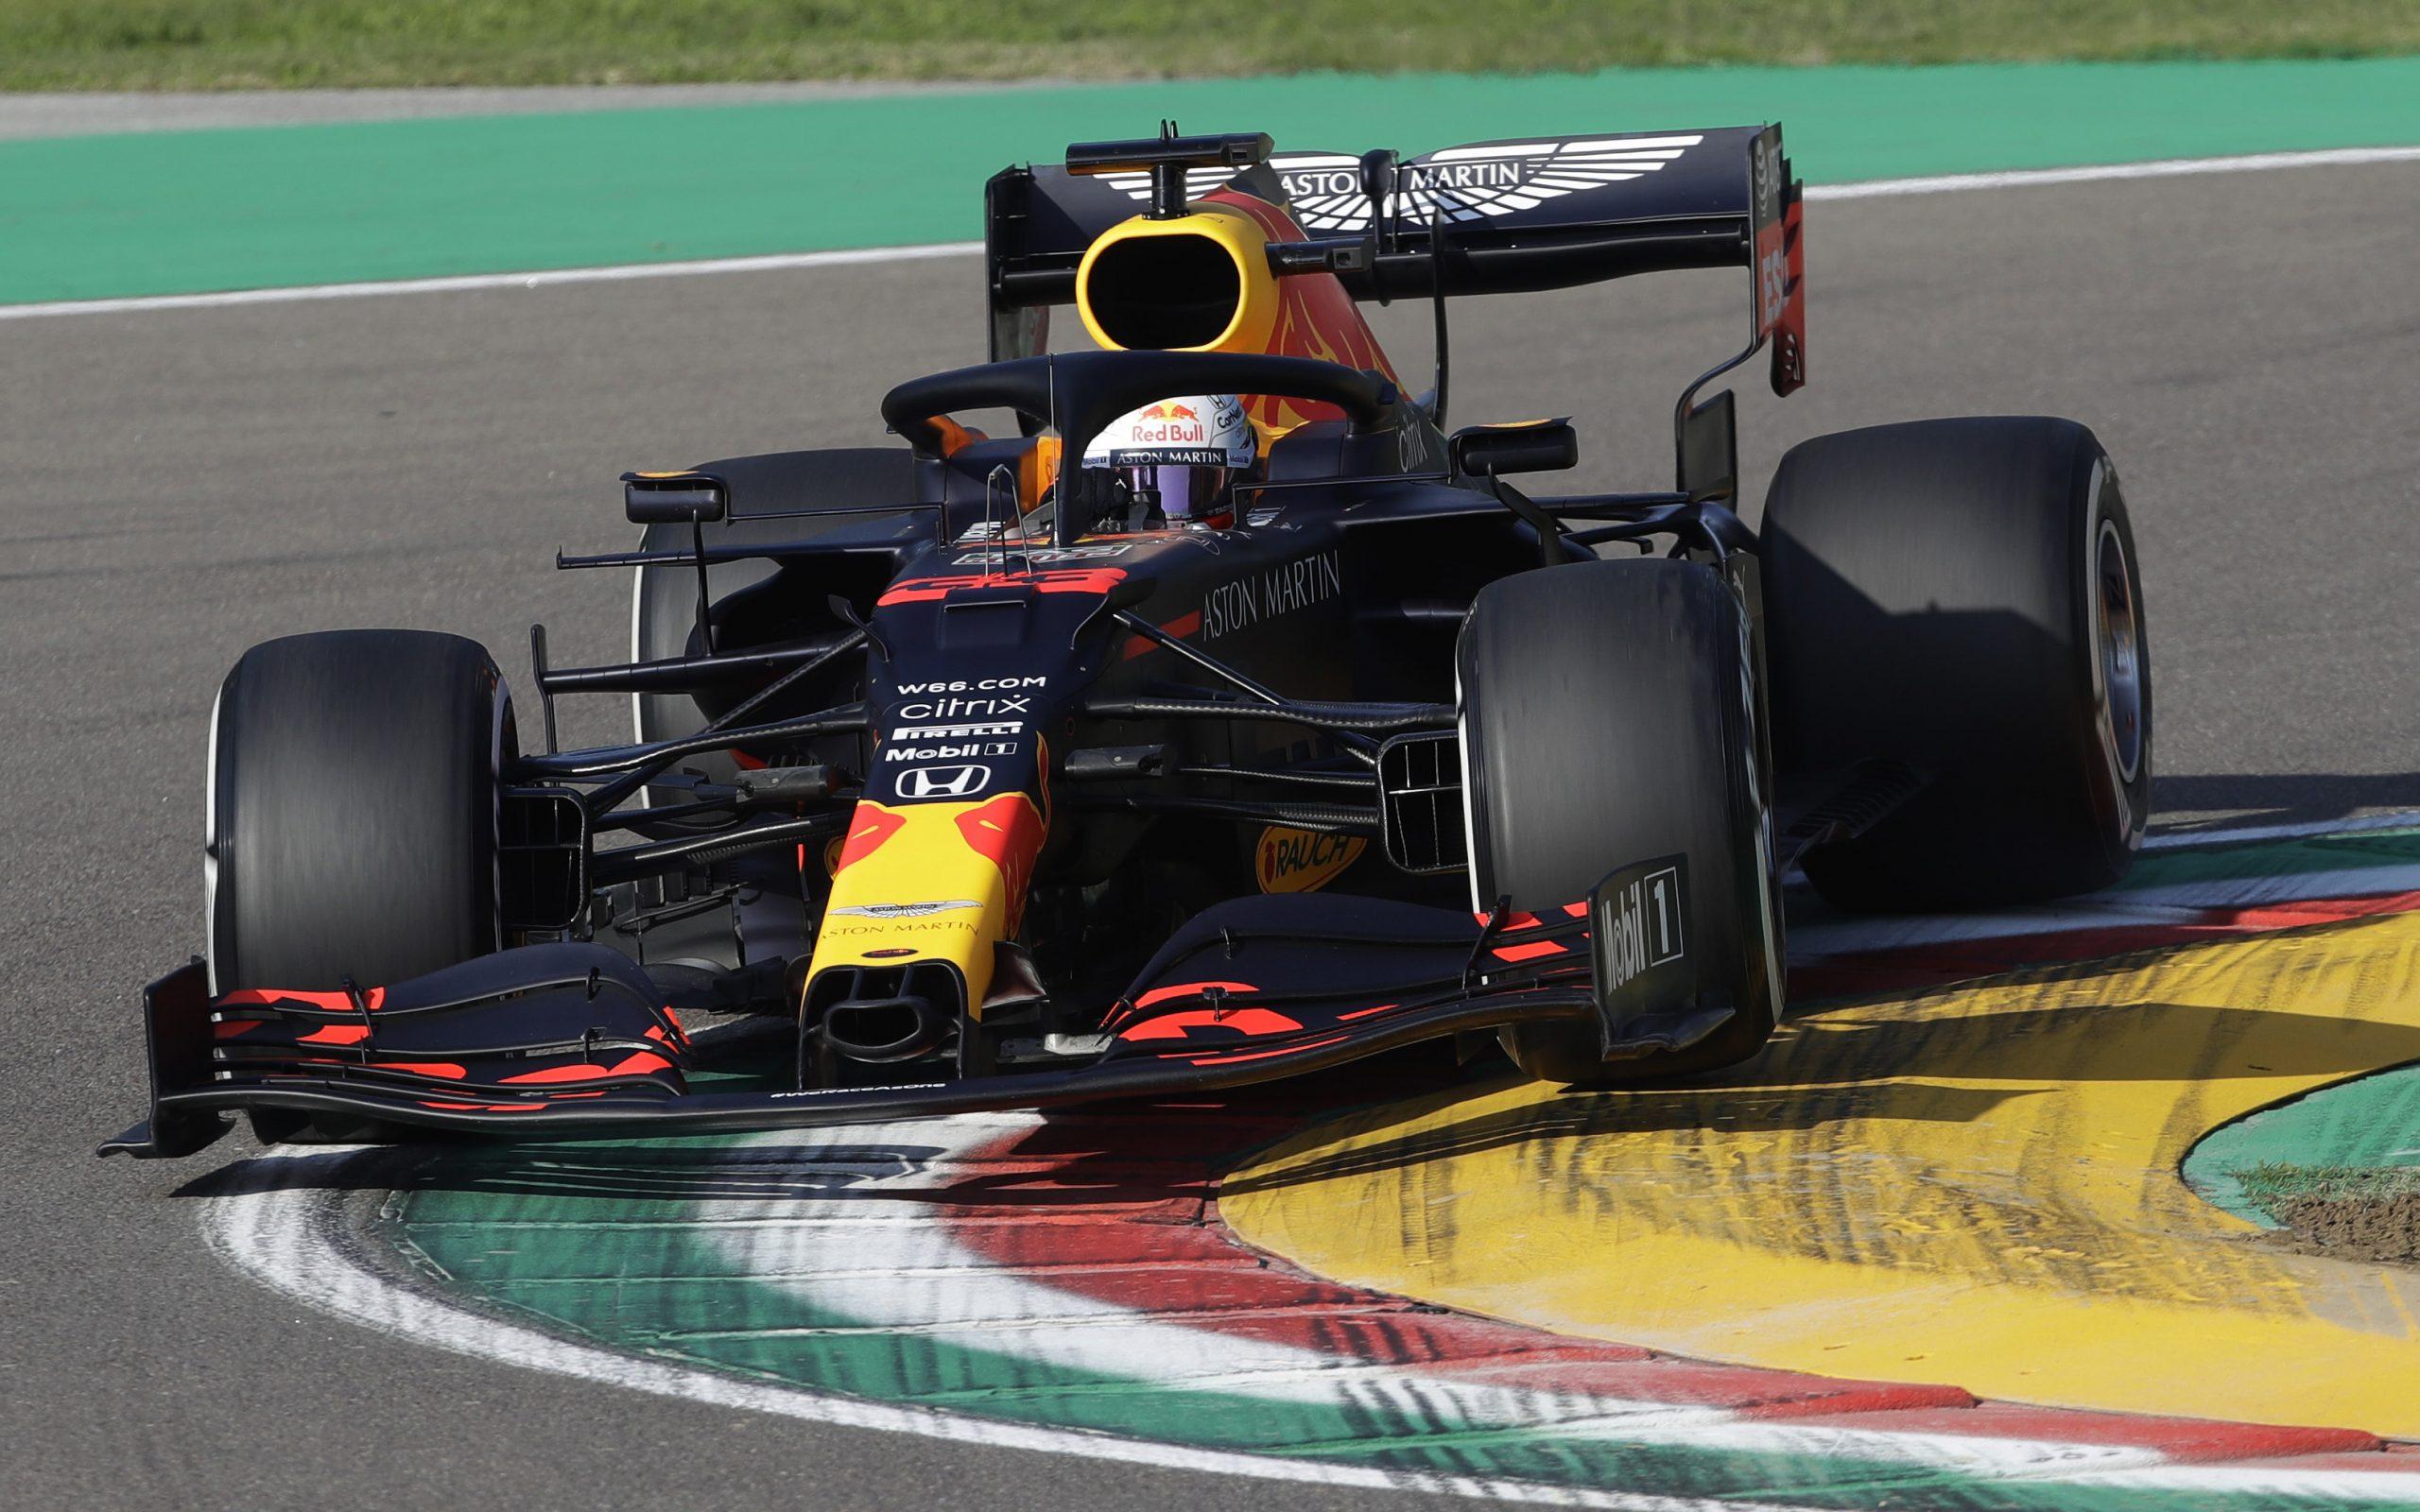 Vrije training van de GP van Emilia-Romagna 2020